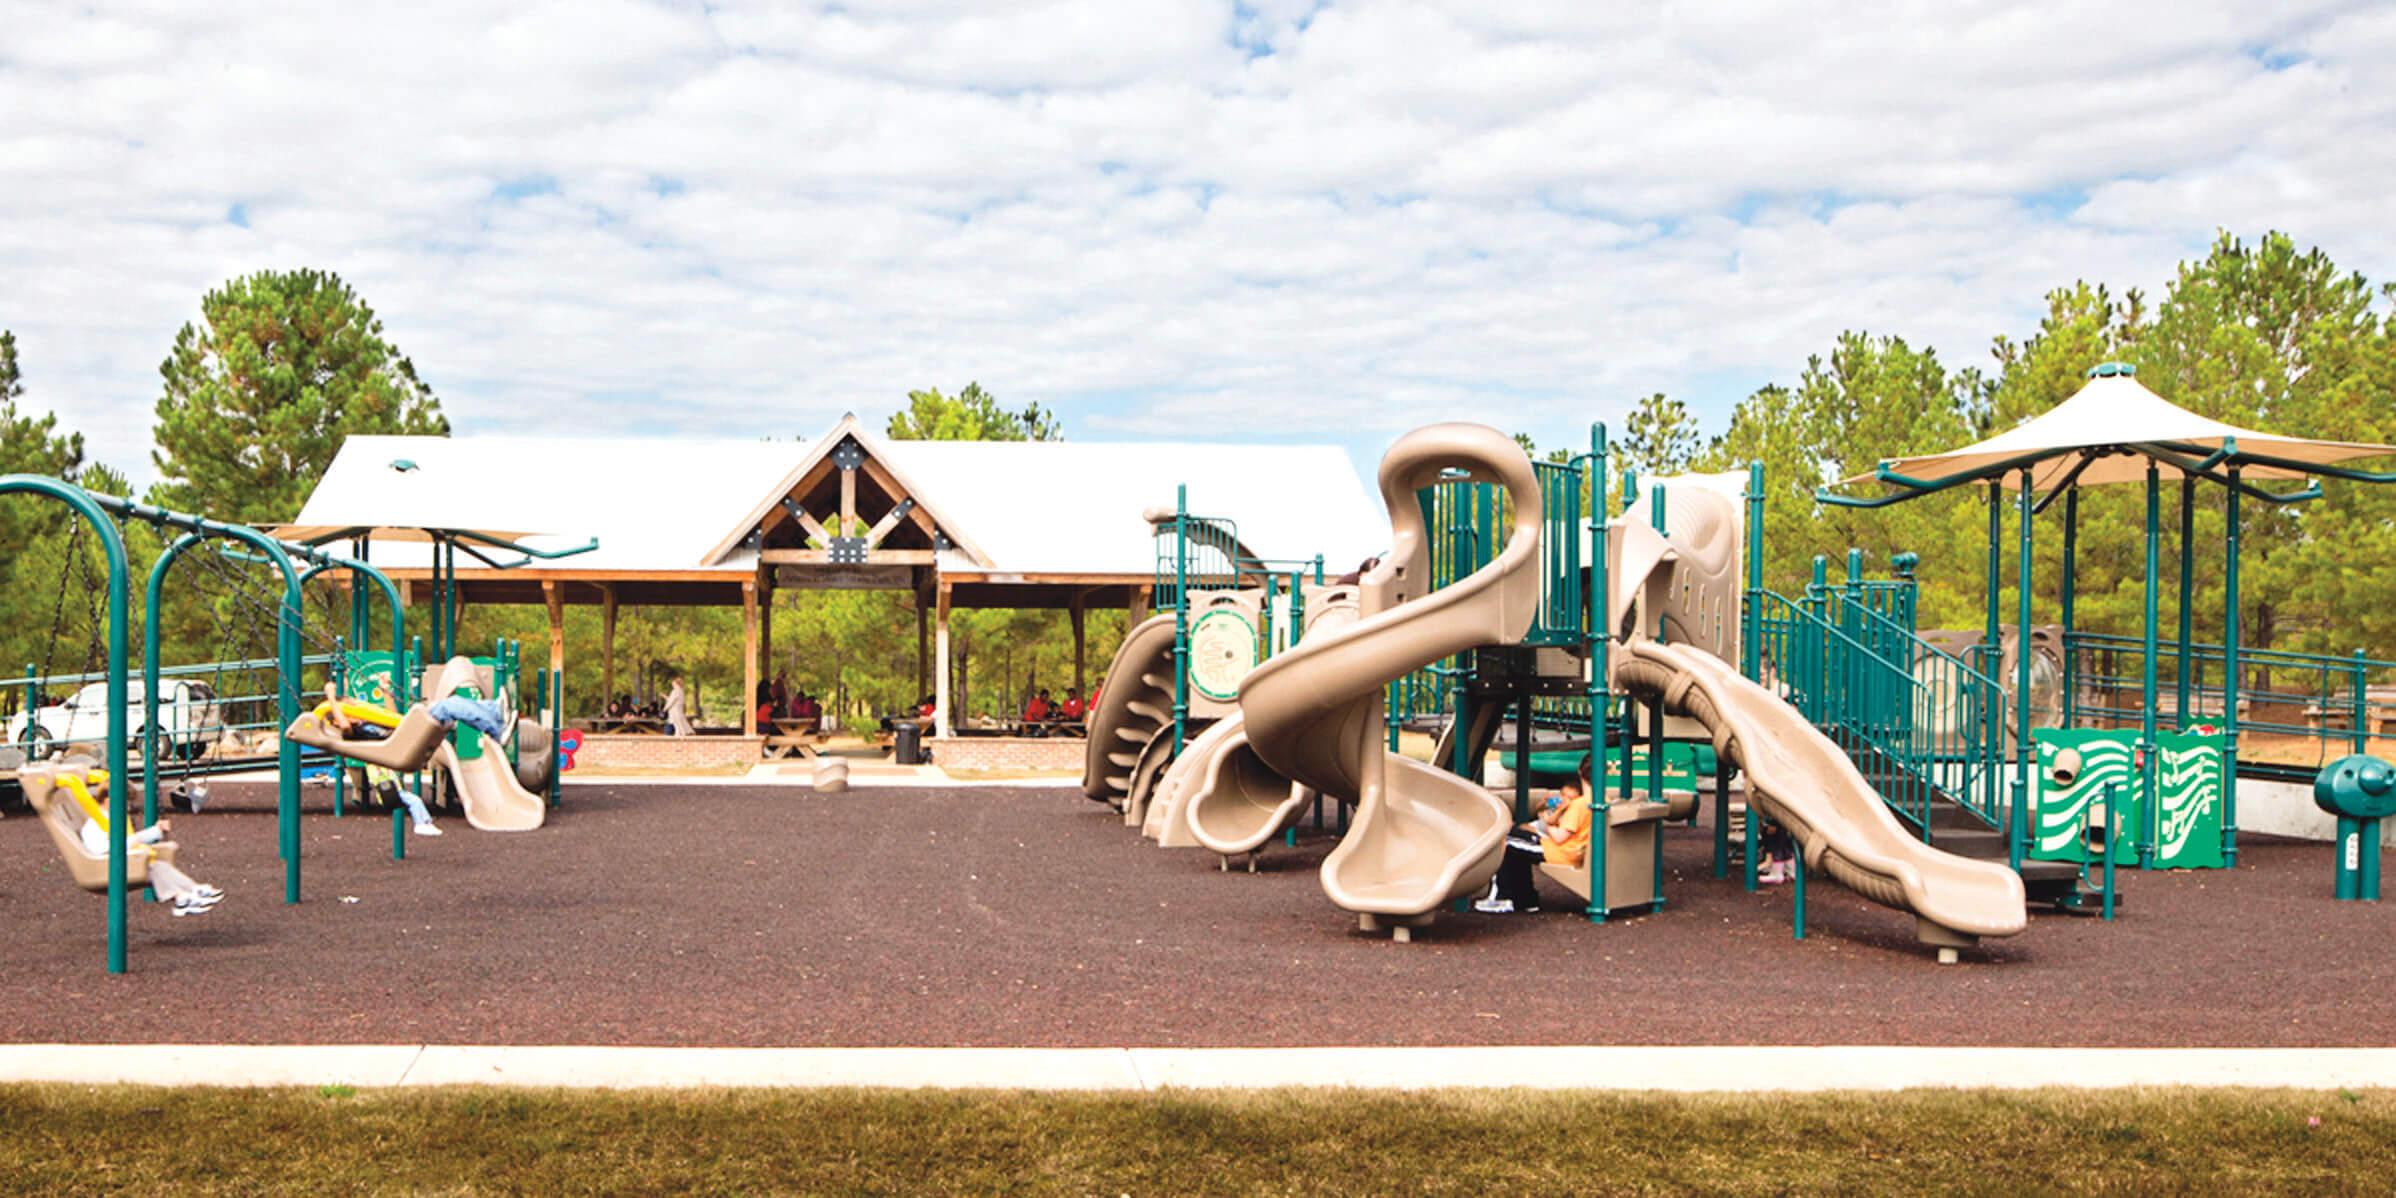 Amerson Playground